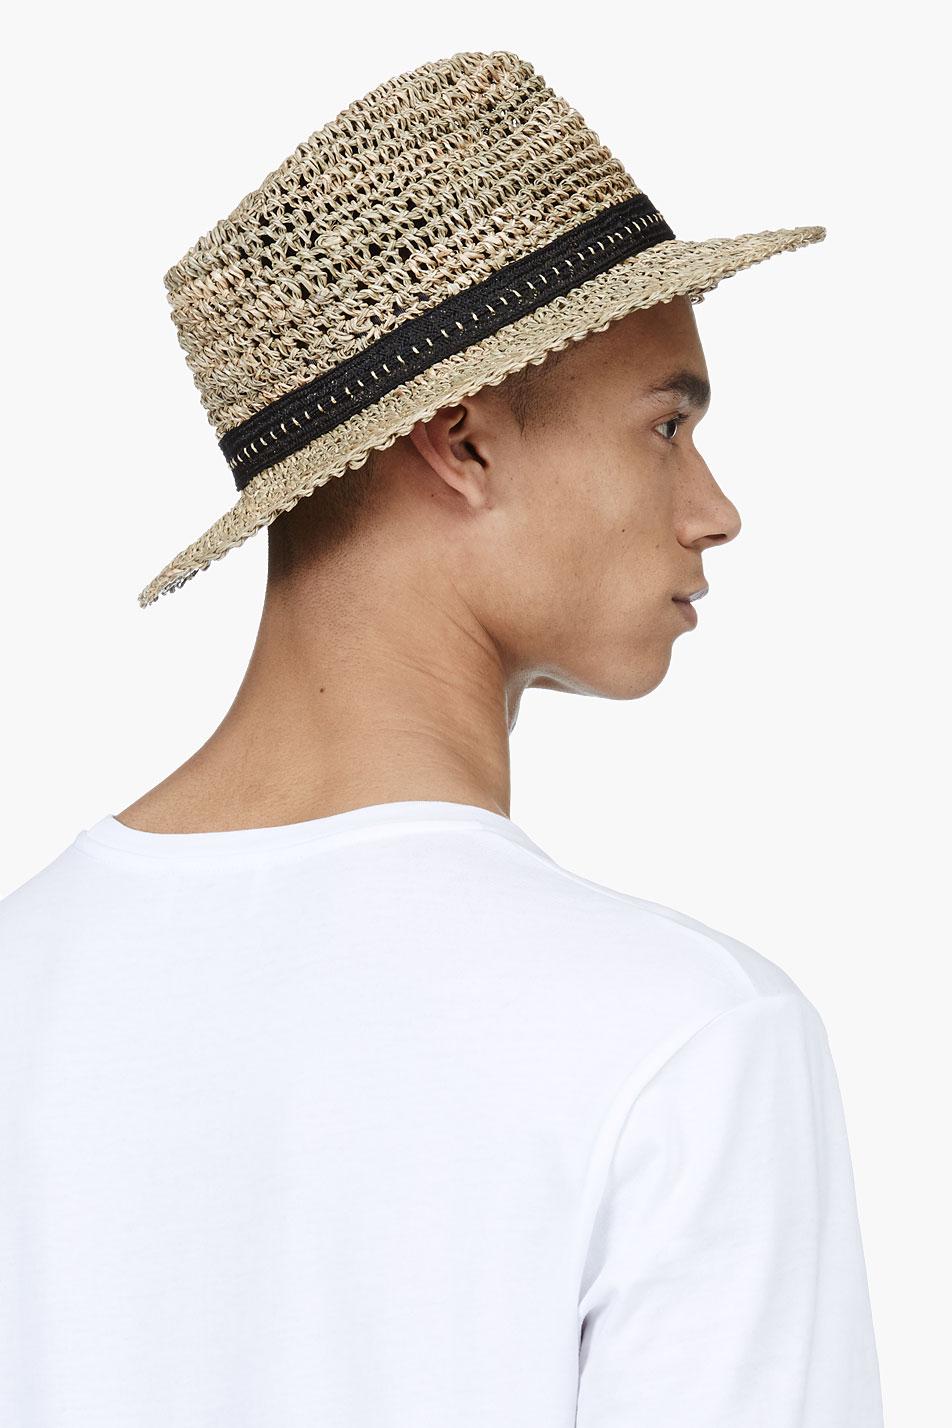 72926b81cf127 Lanvin Beige Open Weave Straw Hat in Natural for Men - Lyst